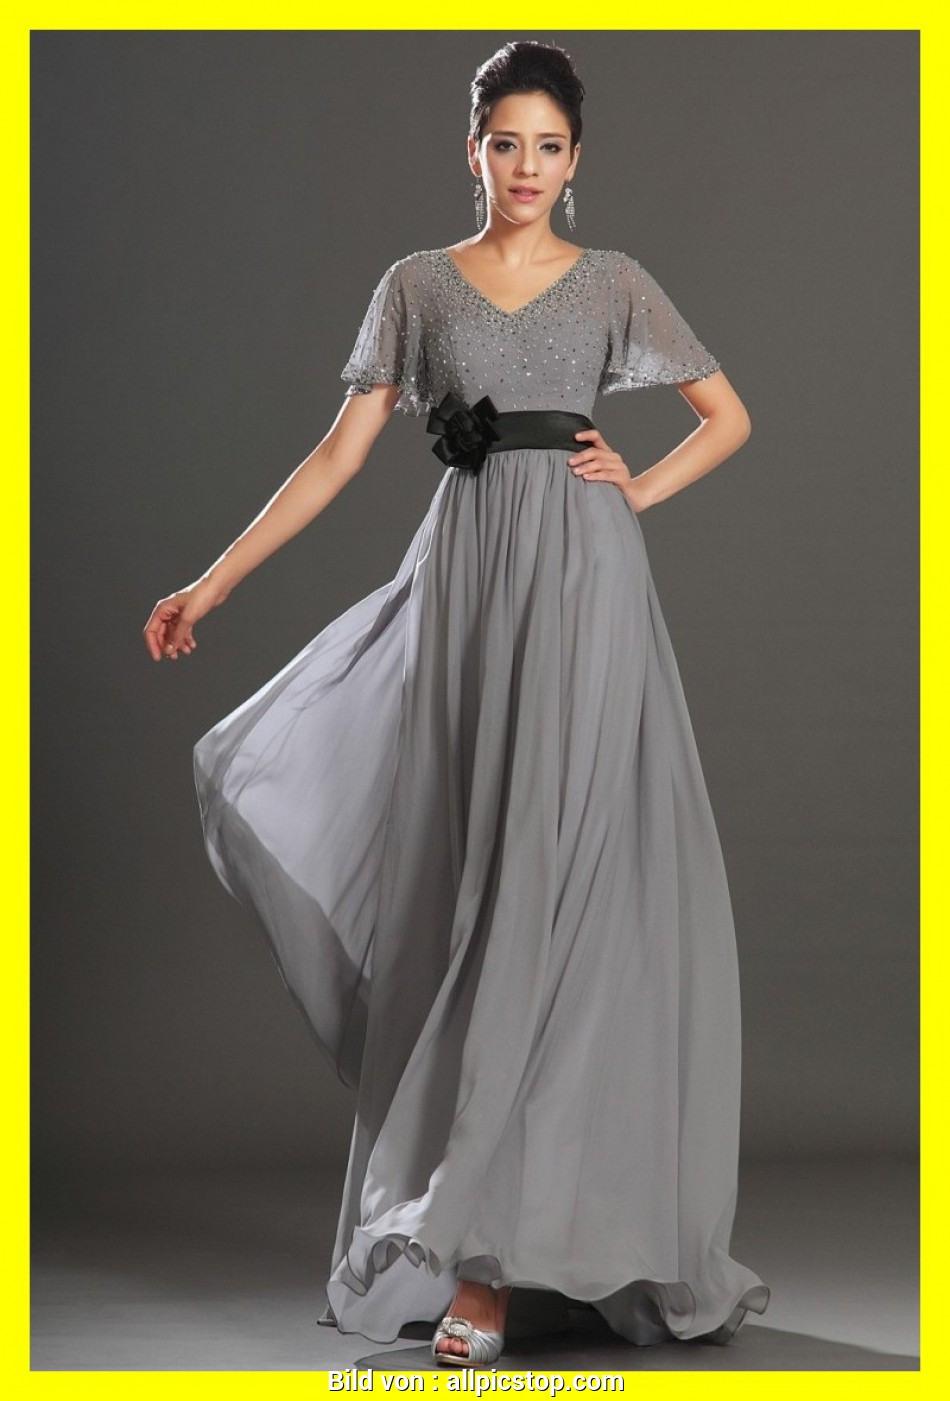 Formal Genial Abendkleider Cunda Stylish20 Wunderbar Abendkleider Cunda Design